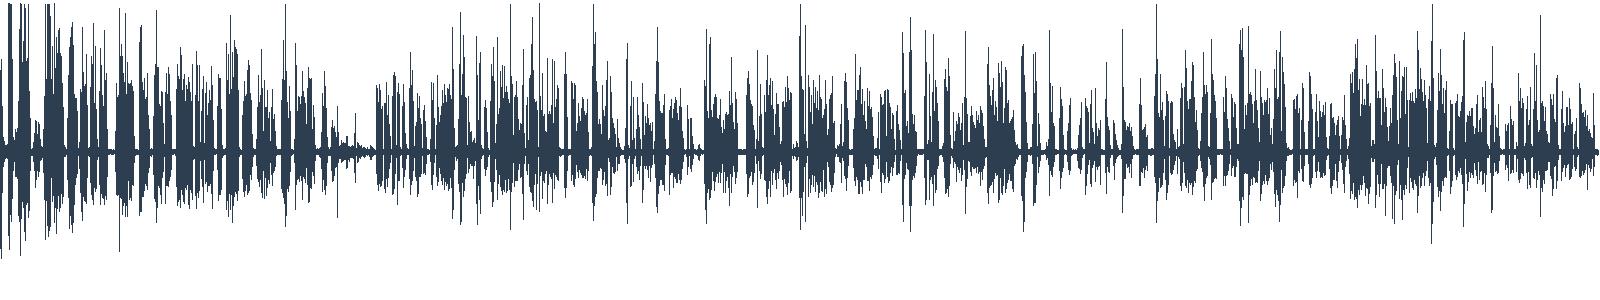 2. pôstna nedeľa waveform